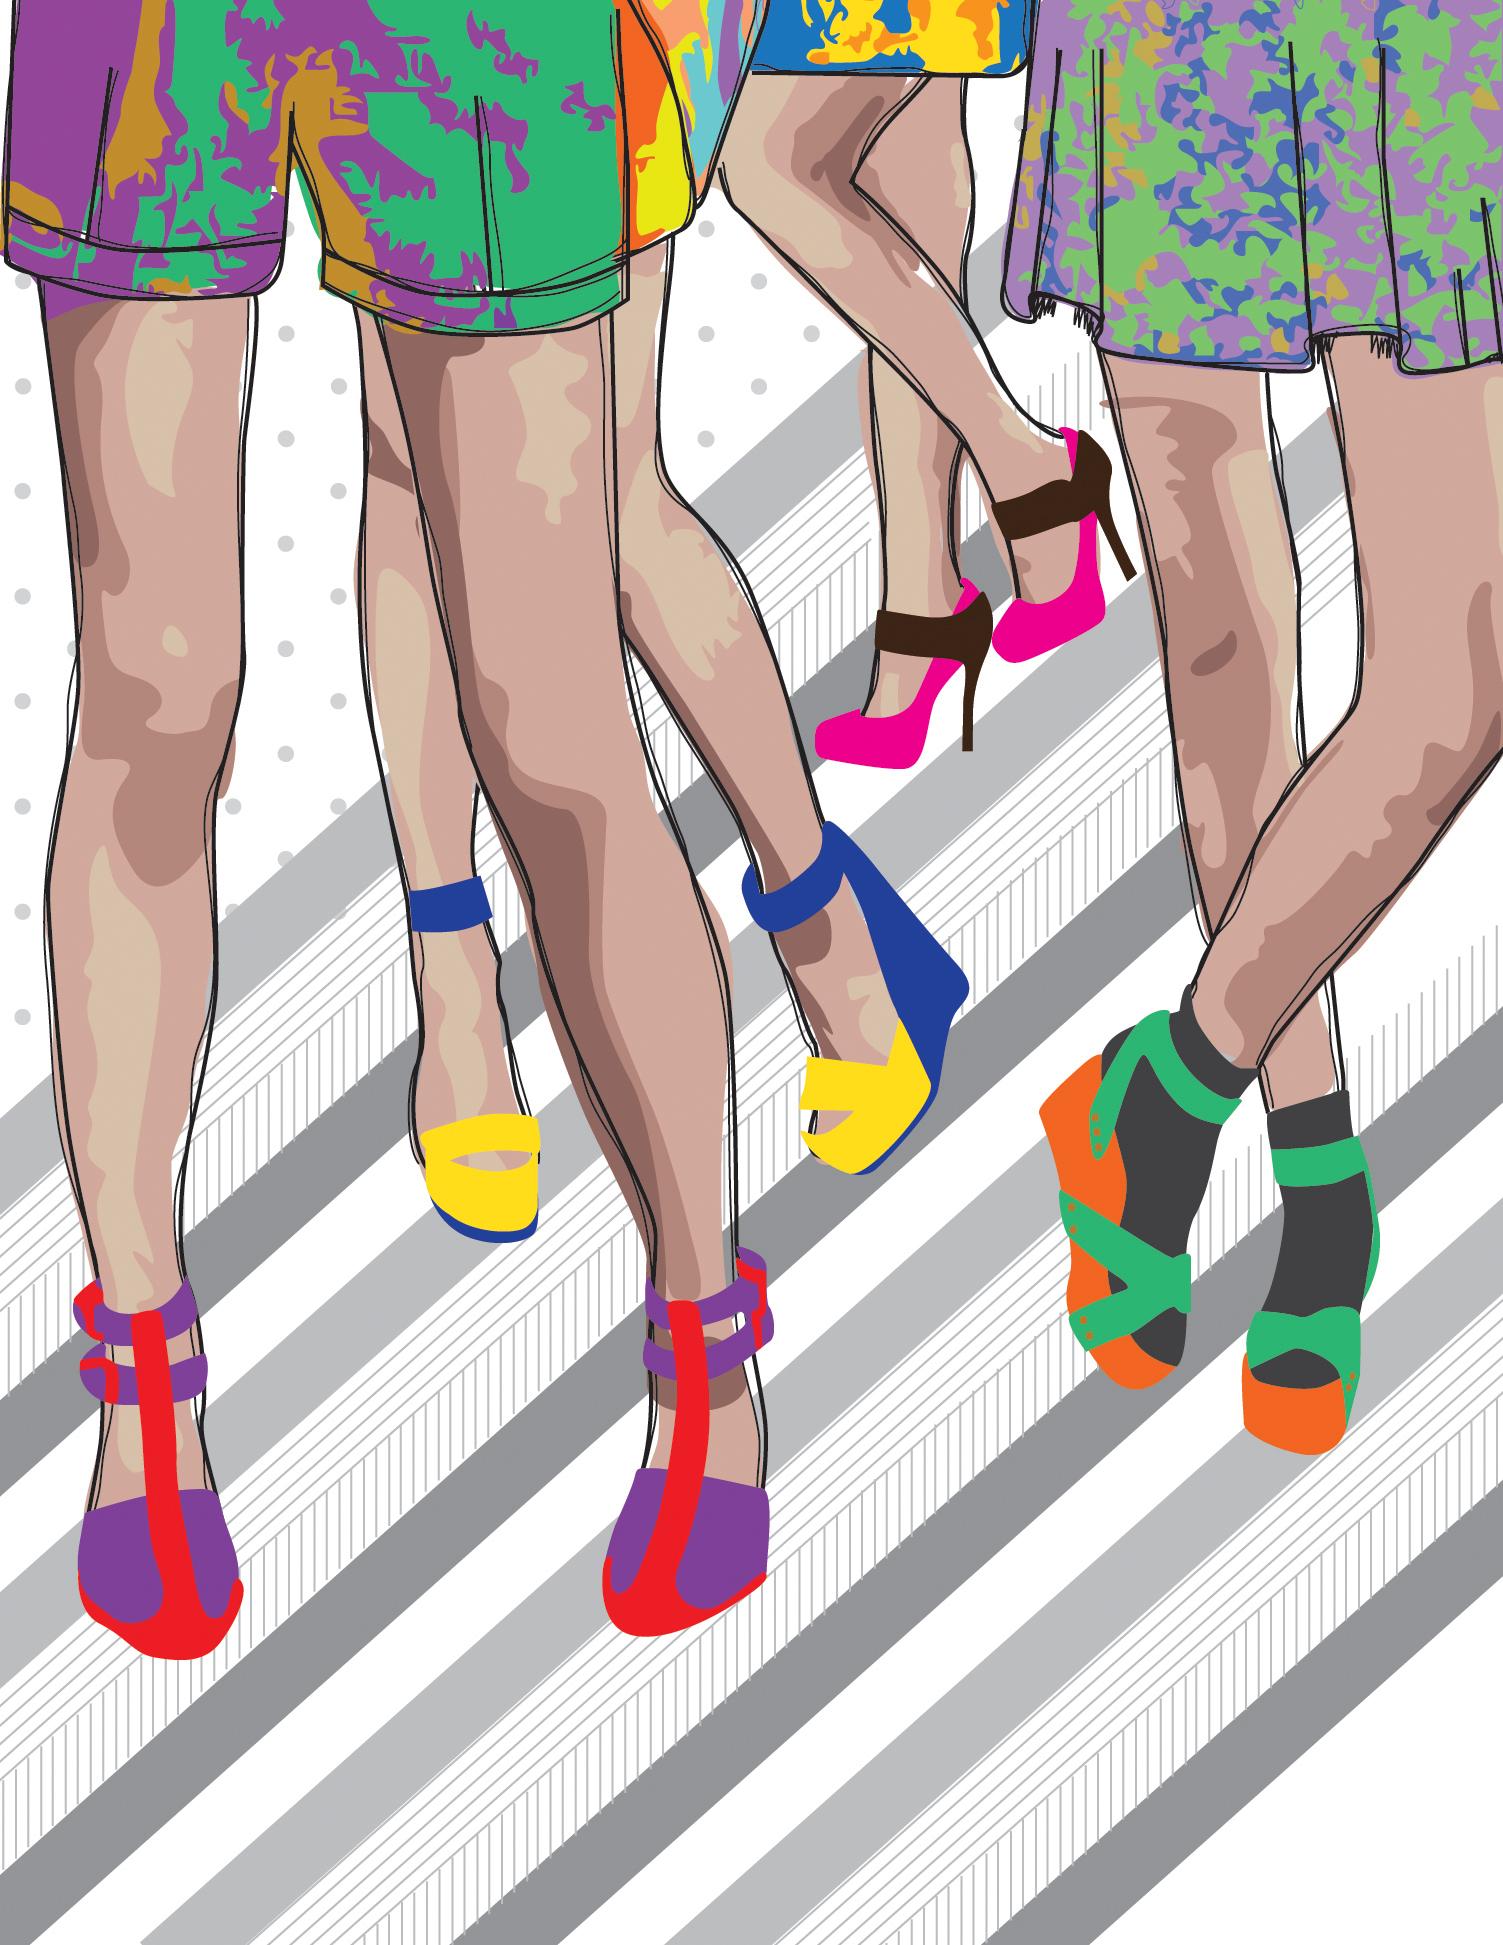 Strut_Multicolored.jpg